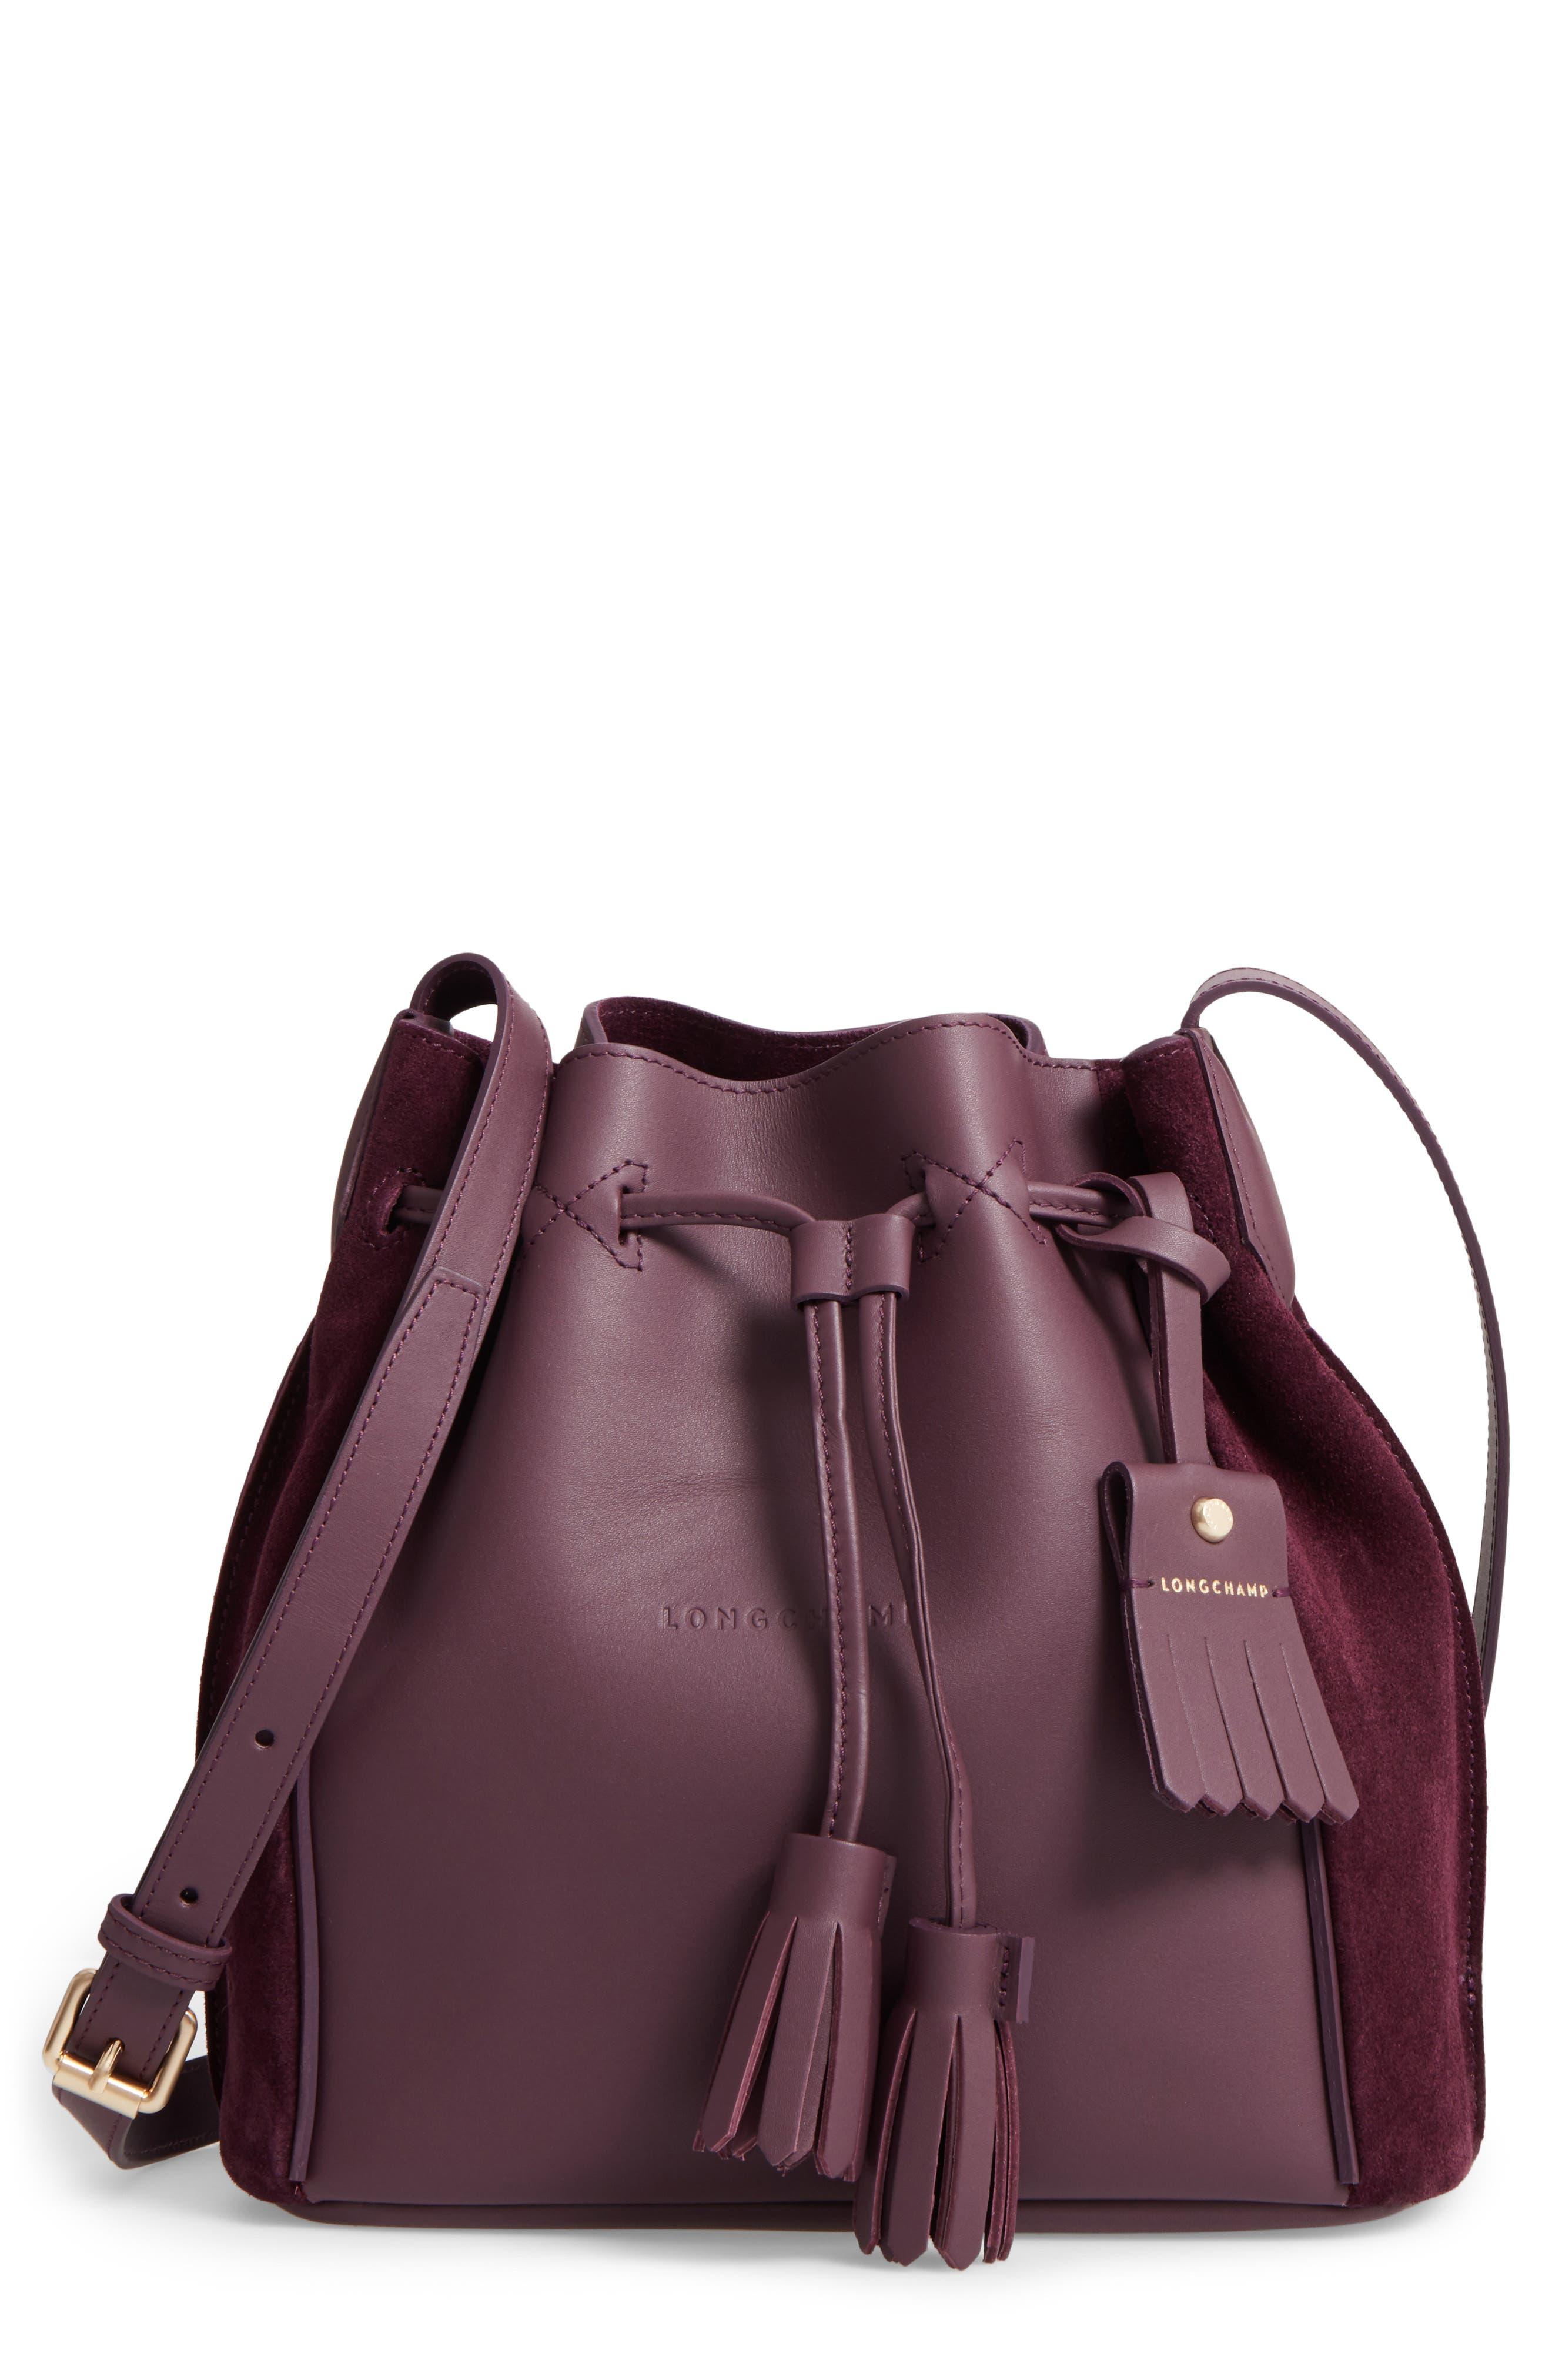 Penelope Fantasie Leather Bucket Bag,                             Main thumbnail 1, color,